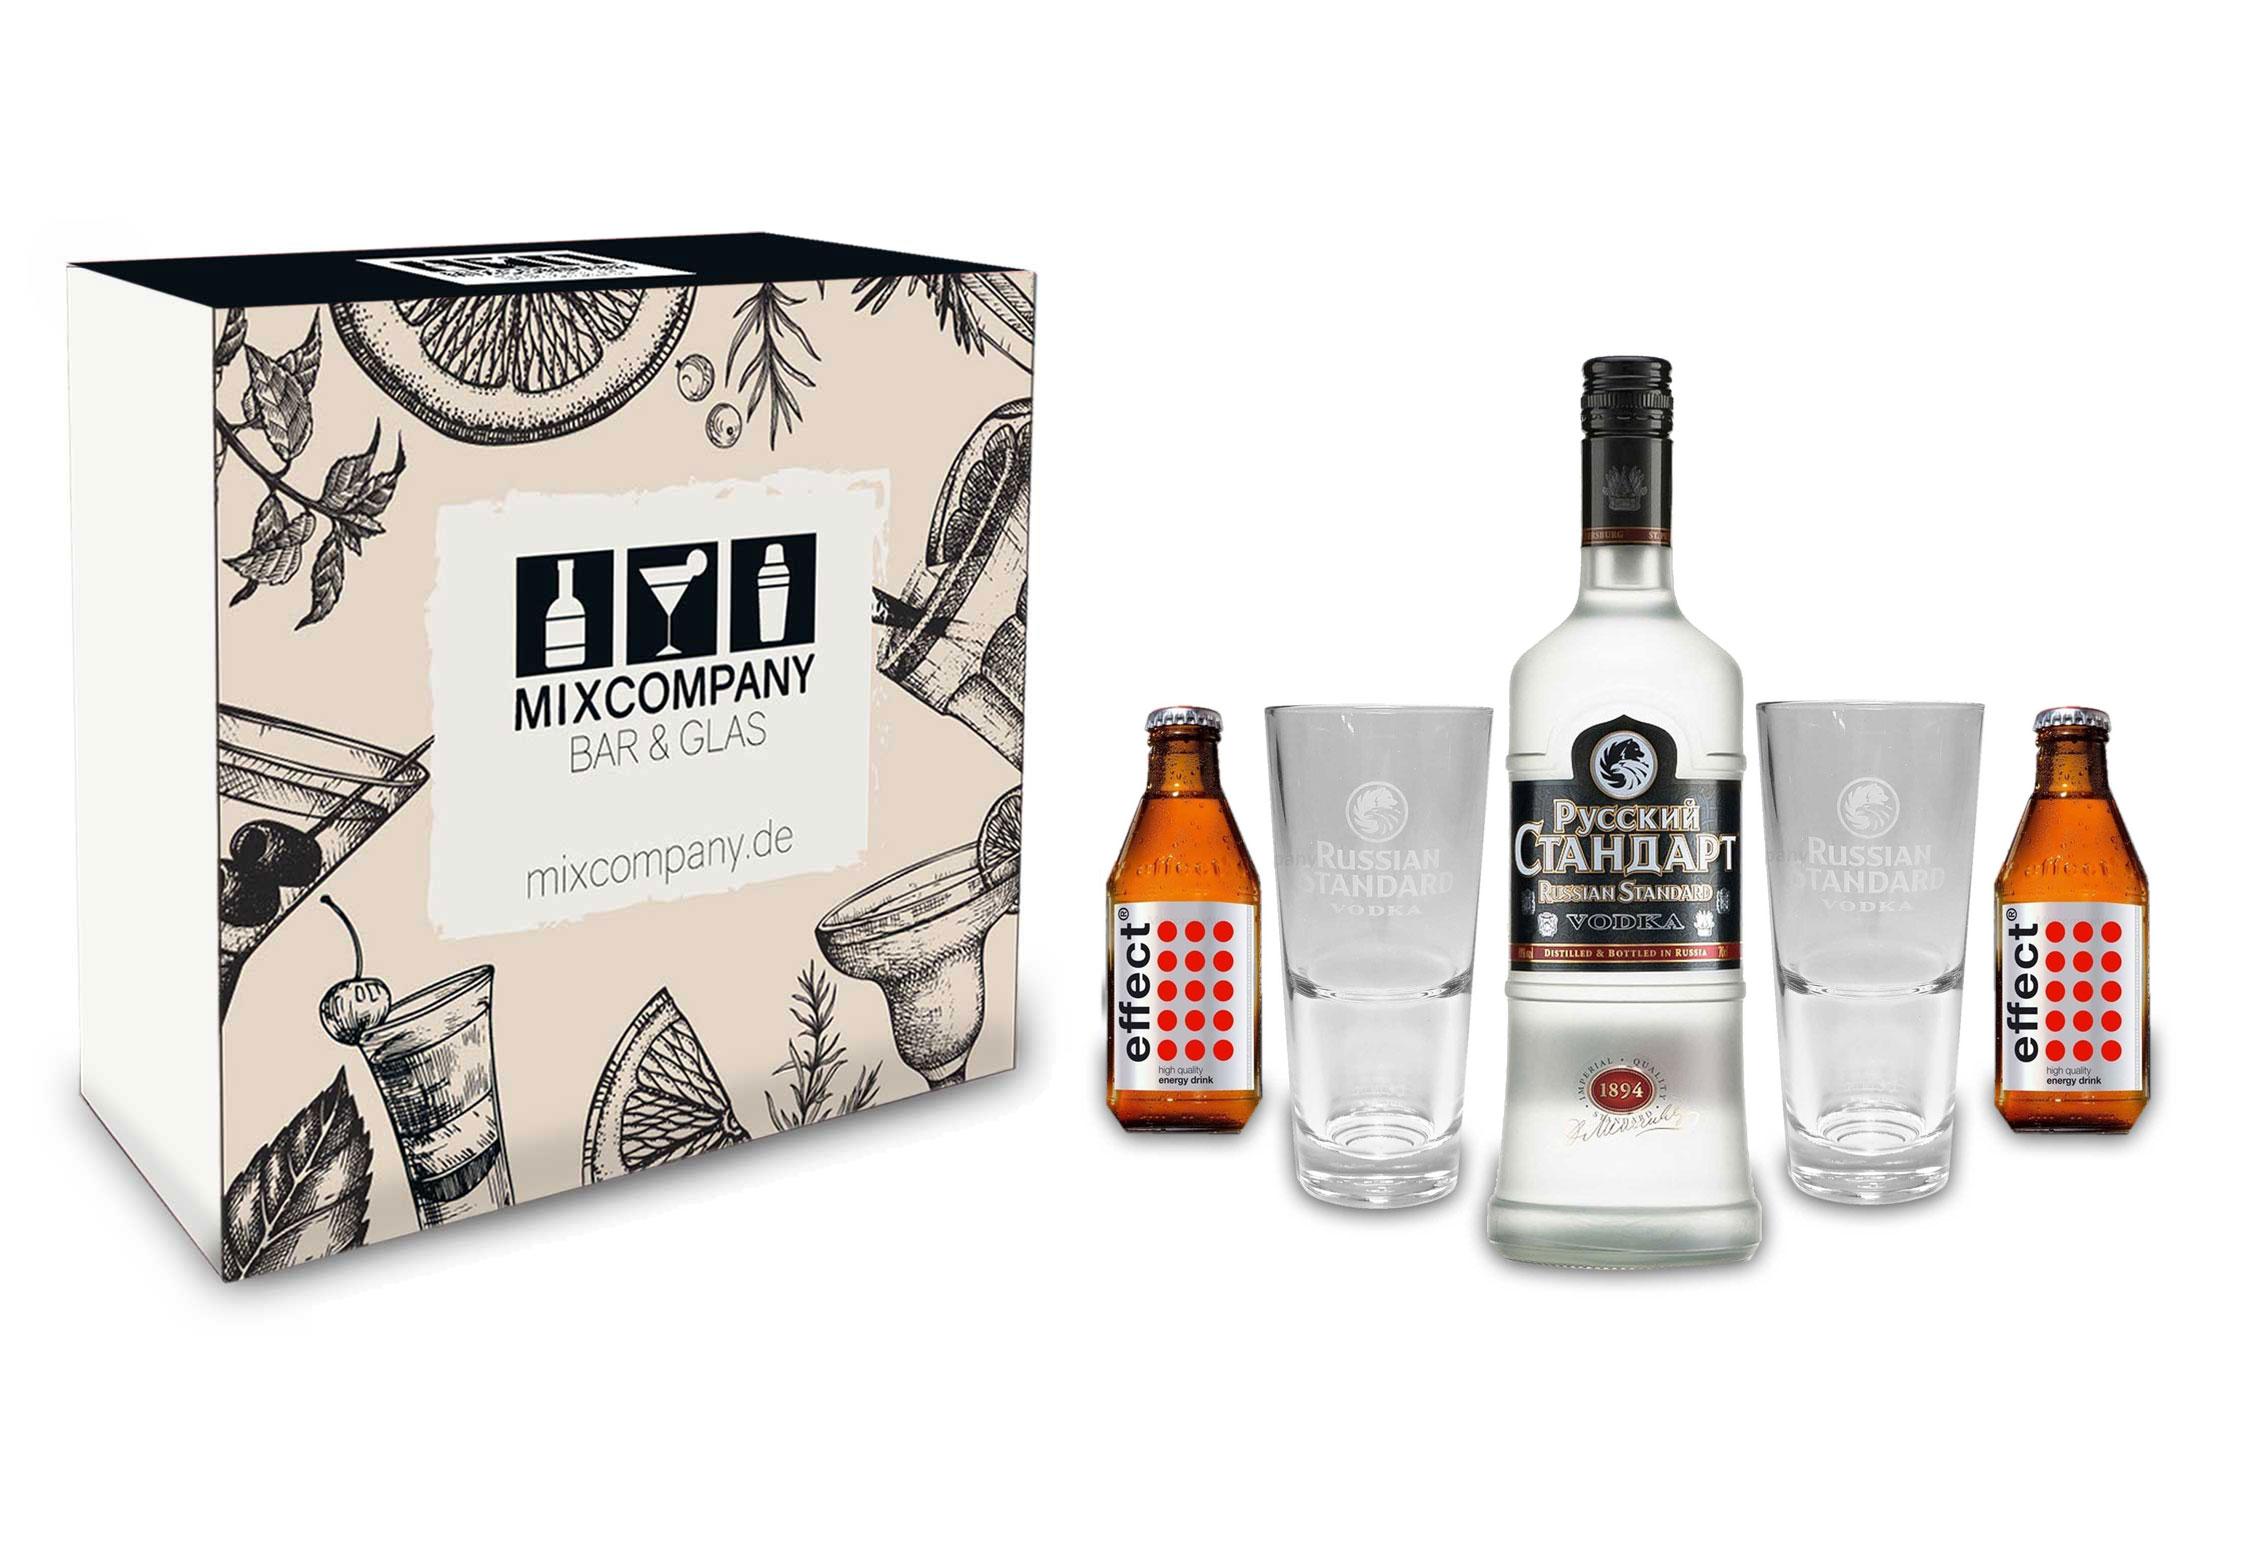 Russian Standard Vodka Set / Geschenkset -Russian Standard Vodka 0,7l 700ml (40% Vol) + 2x Gläser + 2x Effect Energy Drink 200ml inkl. Pfand MEHRWEG